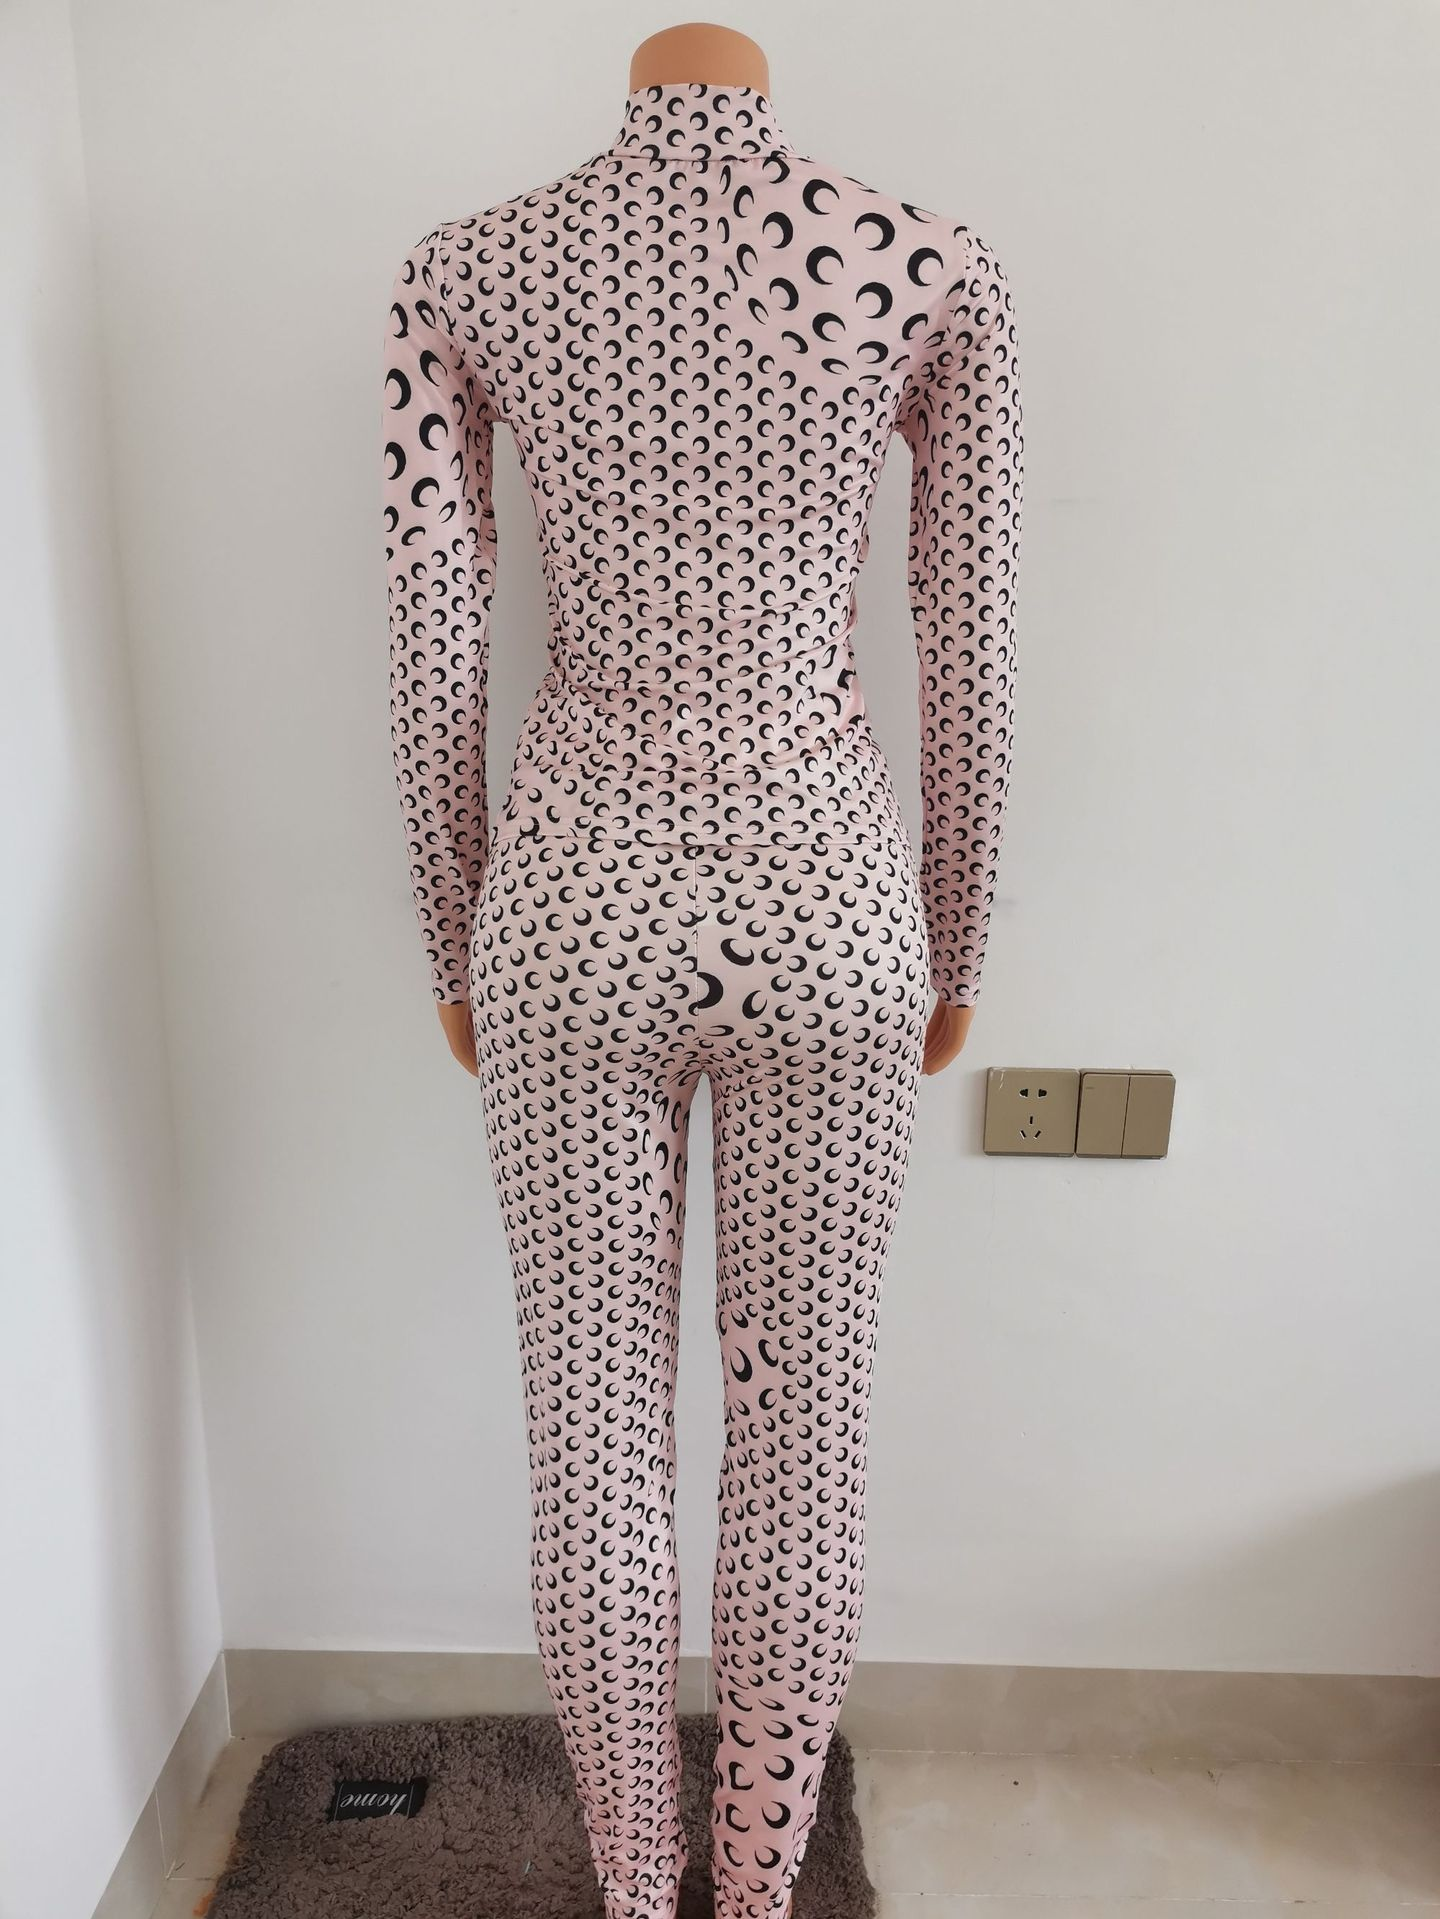 M1049 Moon printed outfits XS 2 piece set fall women fashion clothing